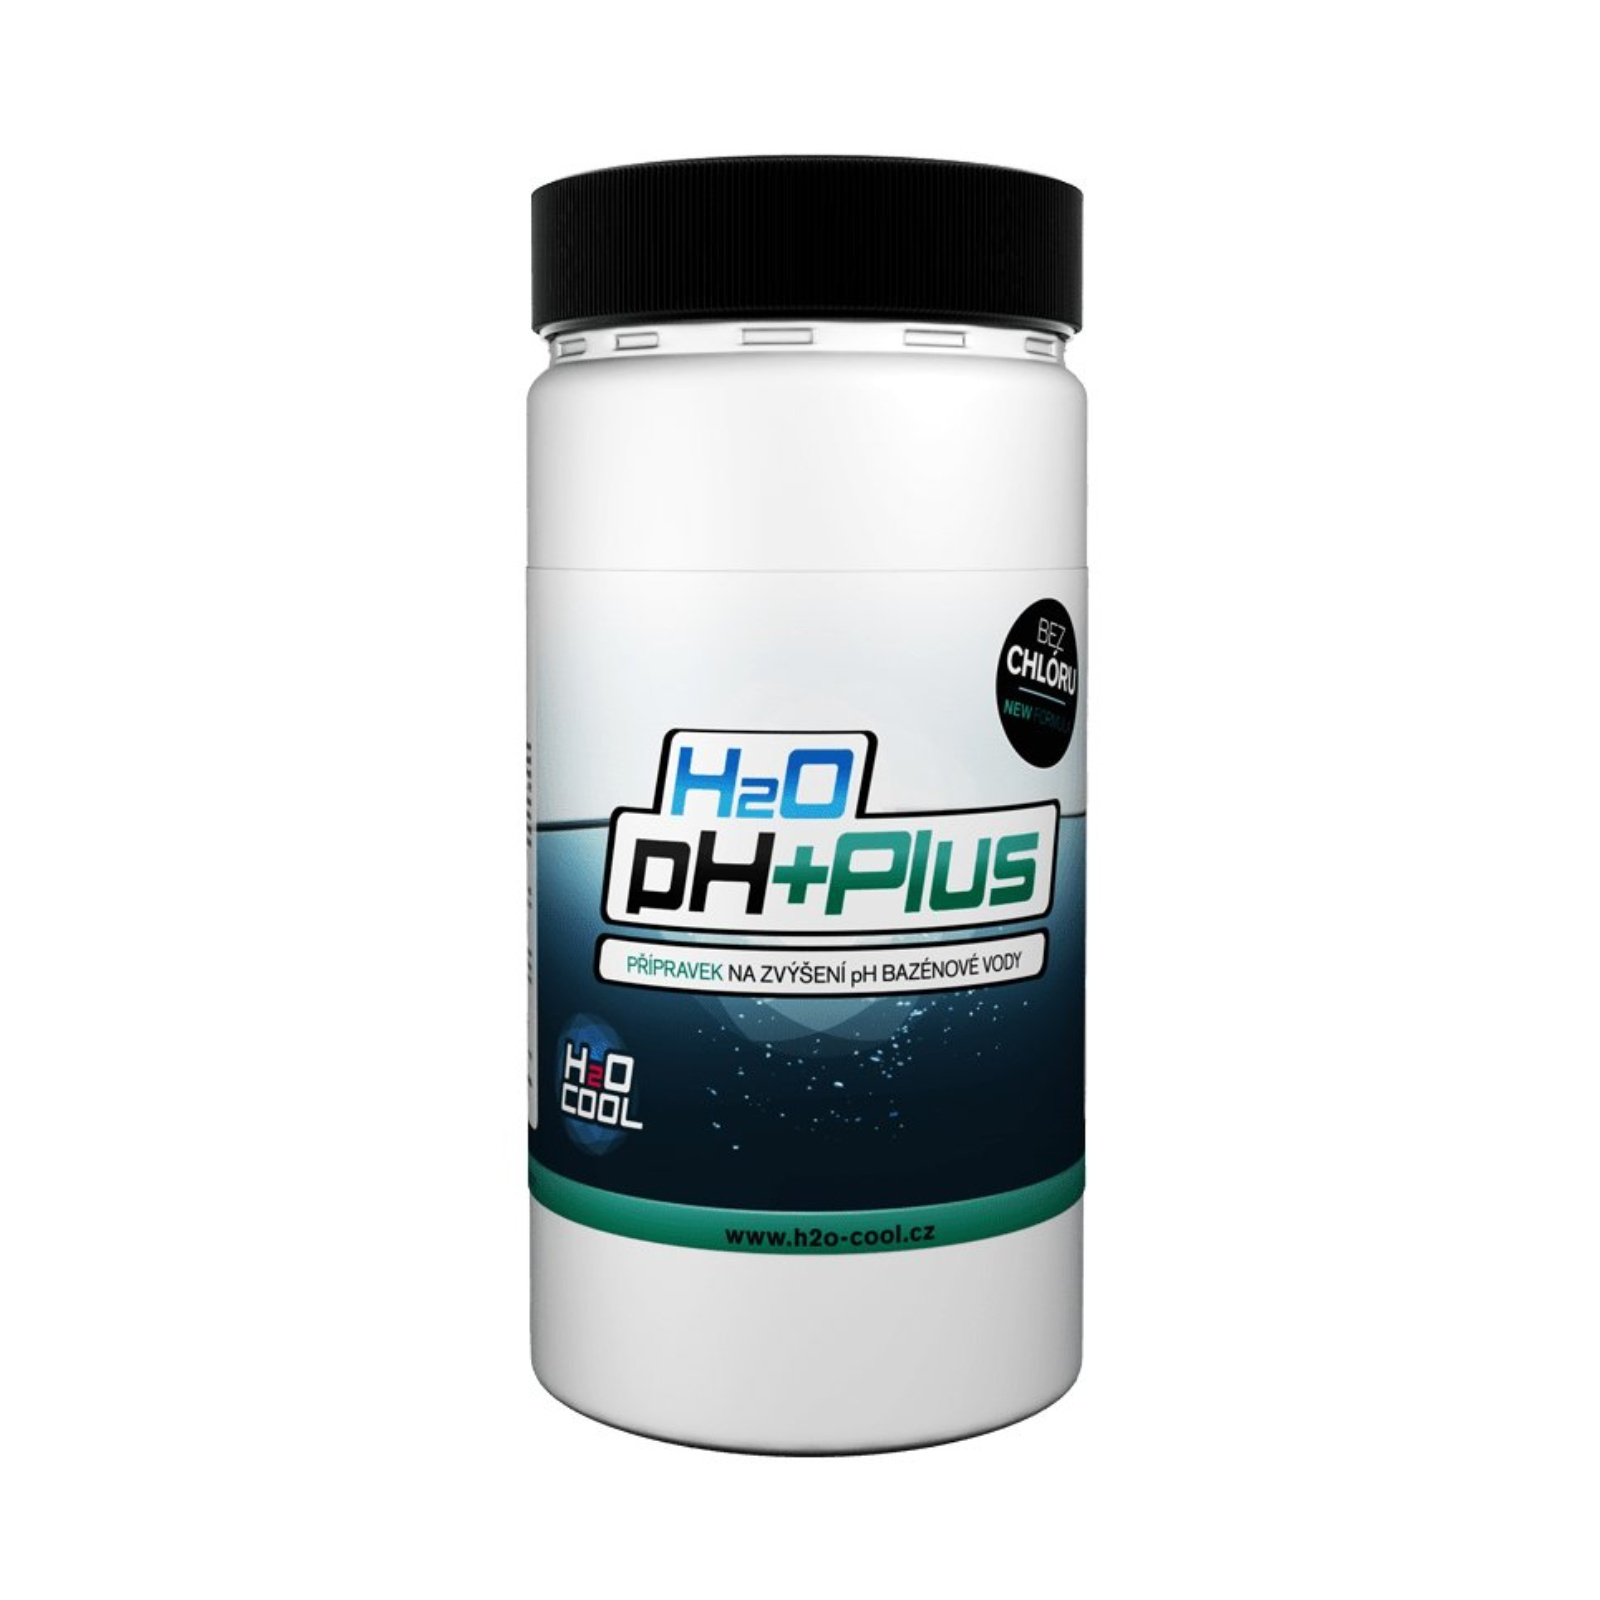 H2O COOL pH plus 2,8 kg